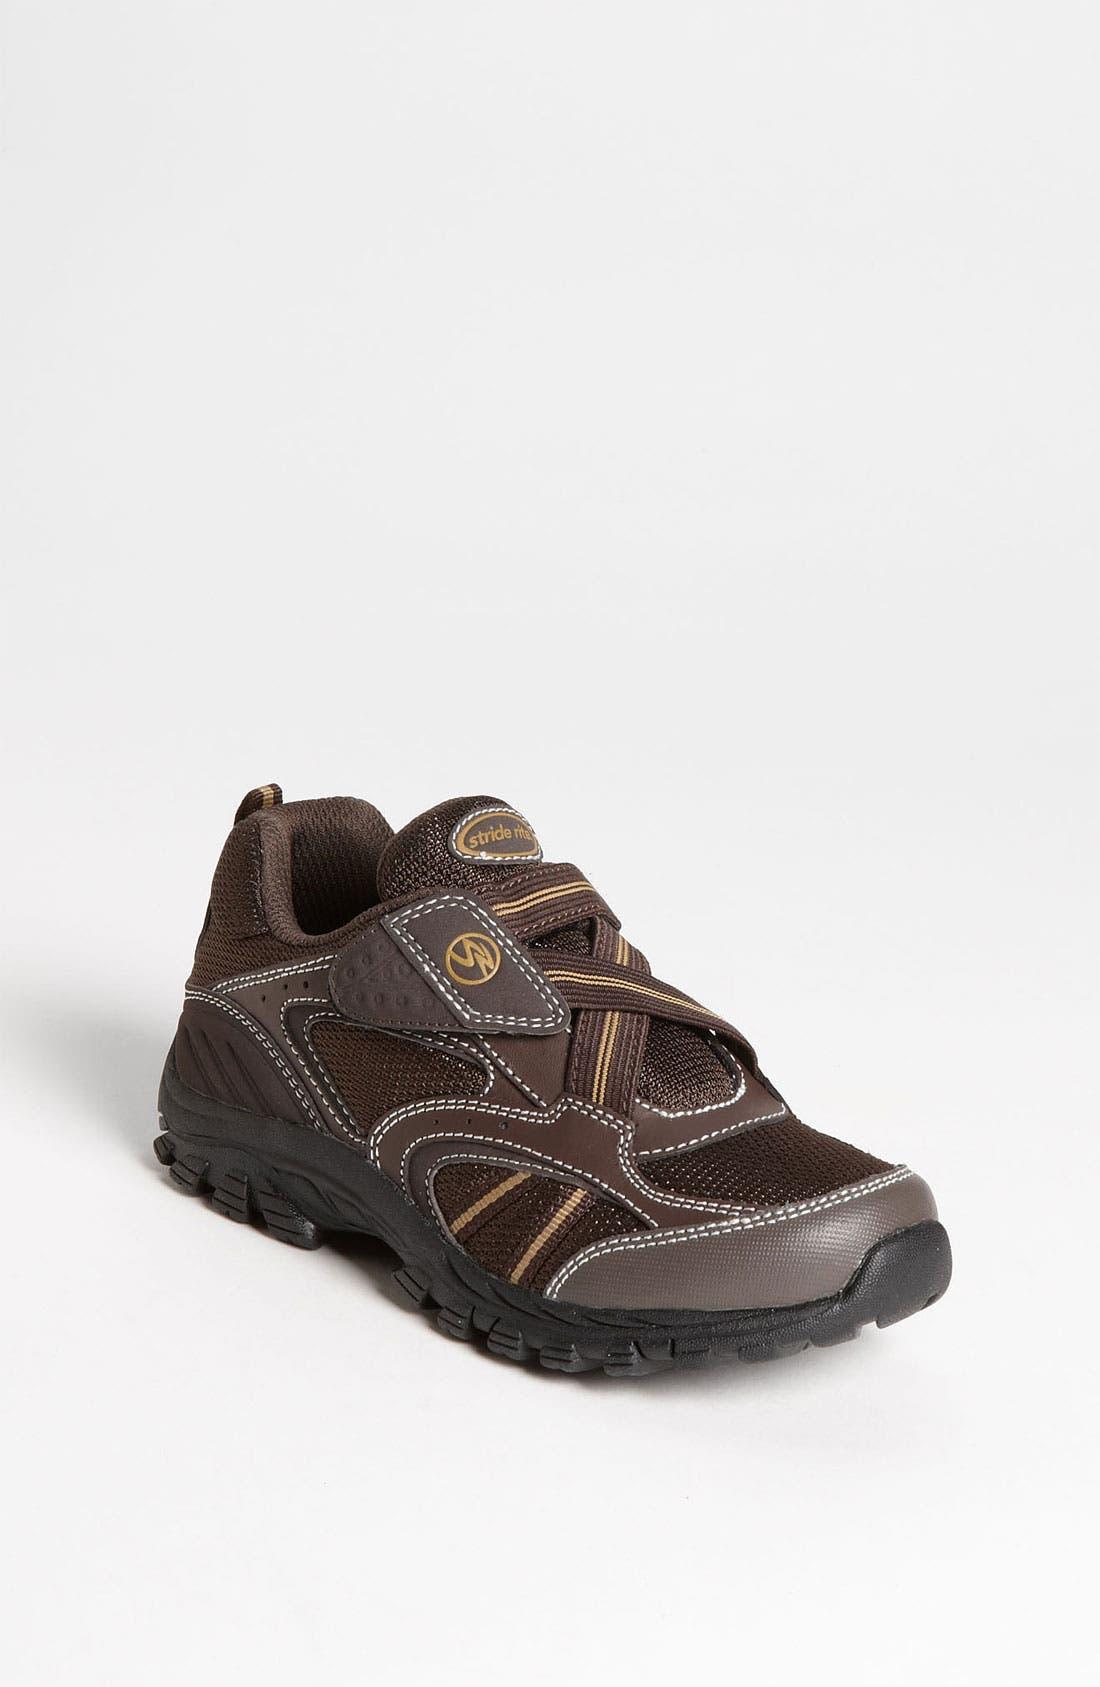 Main Image - Stride Rite 'Clayton' Sneaker (Toddler & Little Kid)